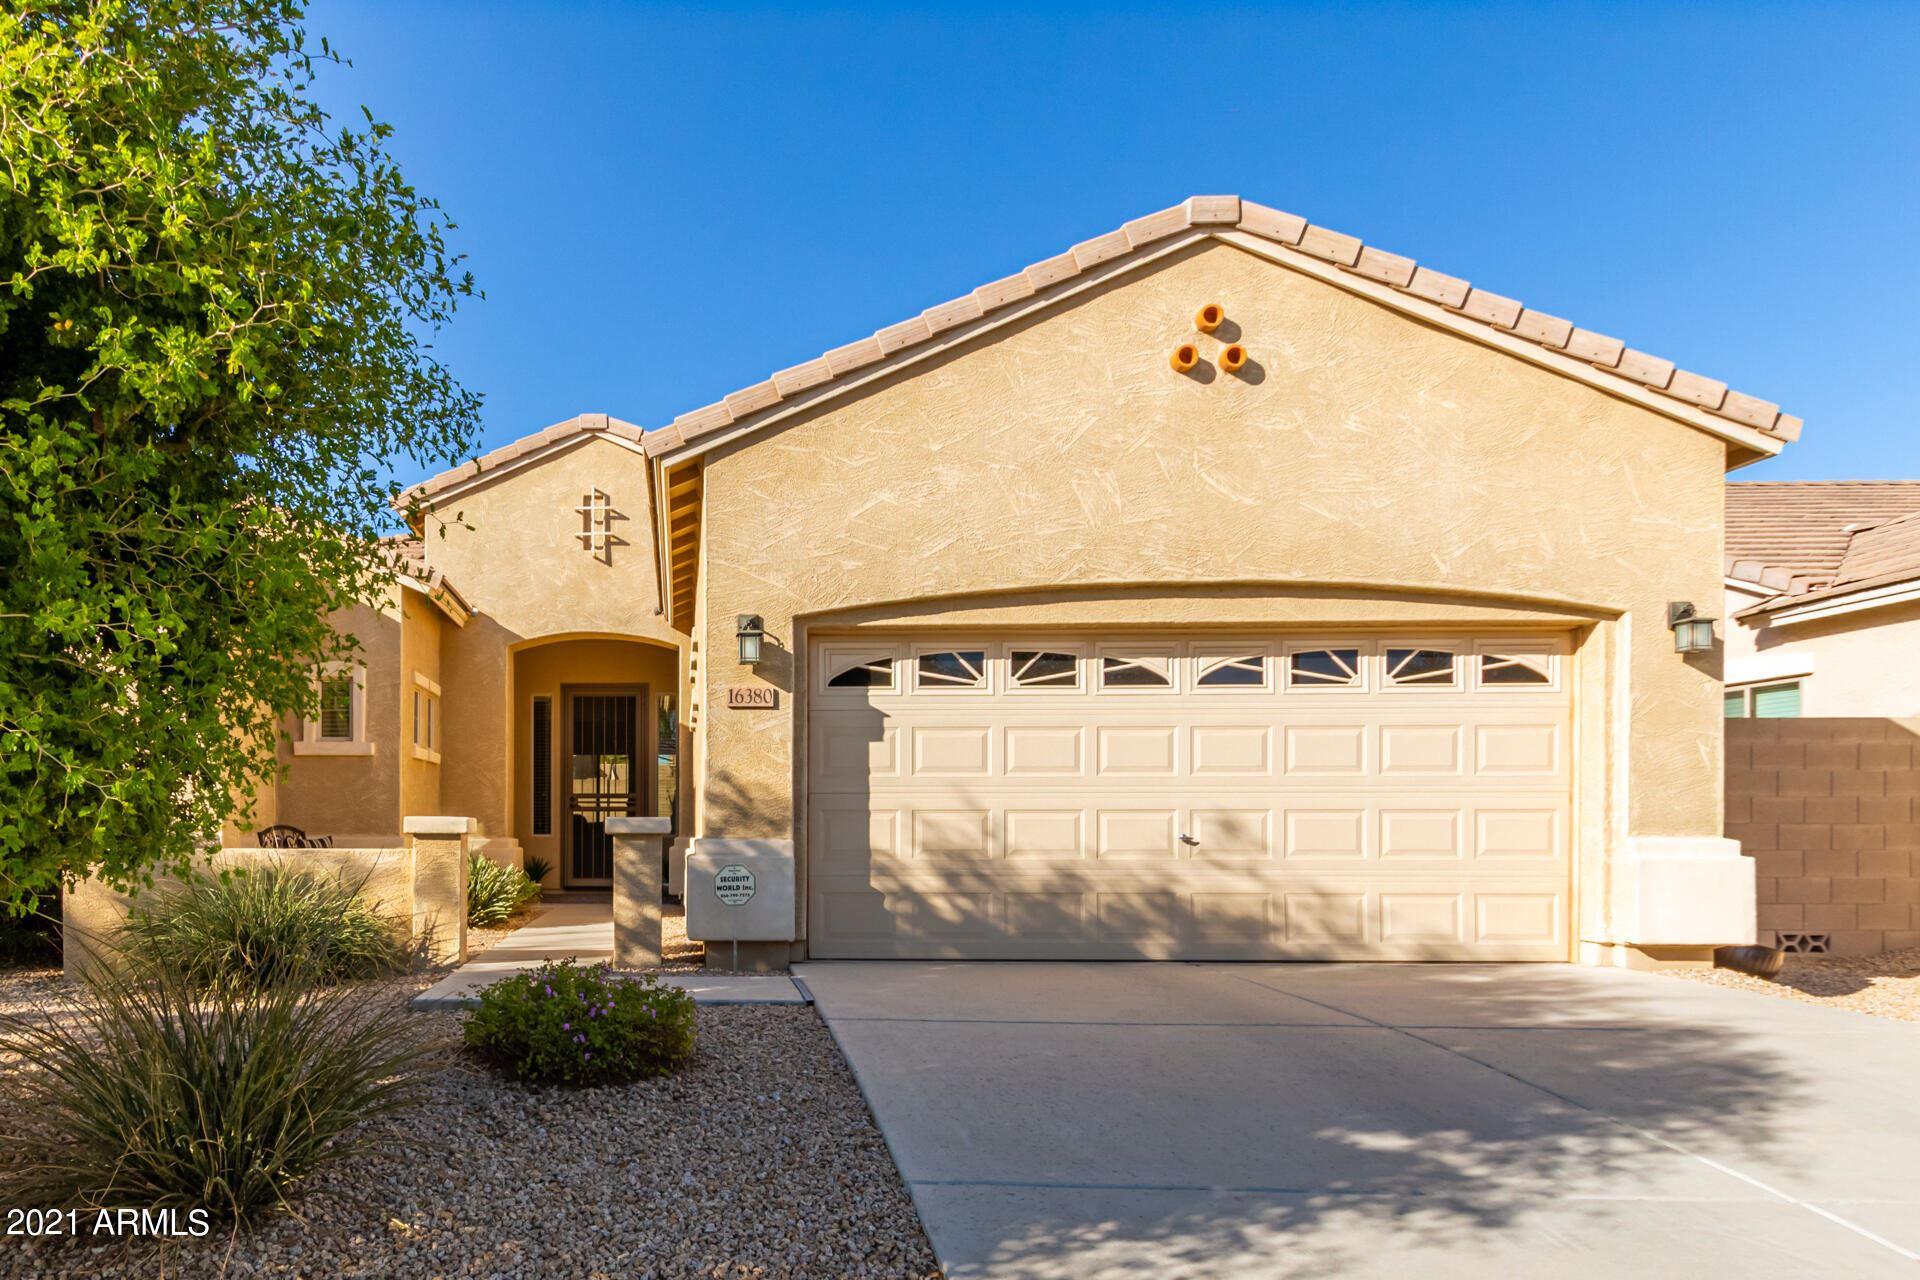 Photo of 16380 W CAMERON Drive, Surprise, AZ 85388 (MLS # 6307009)